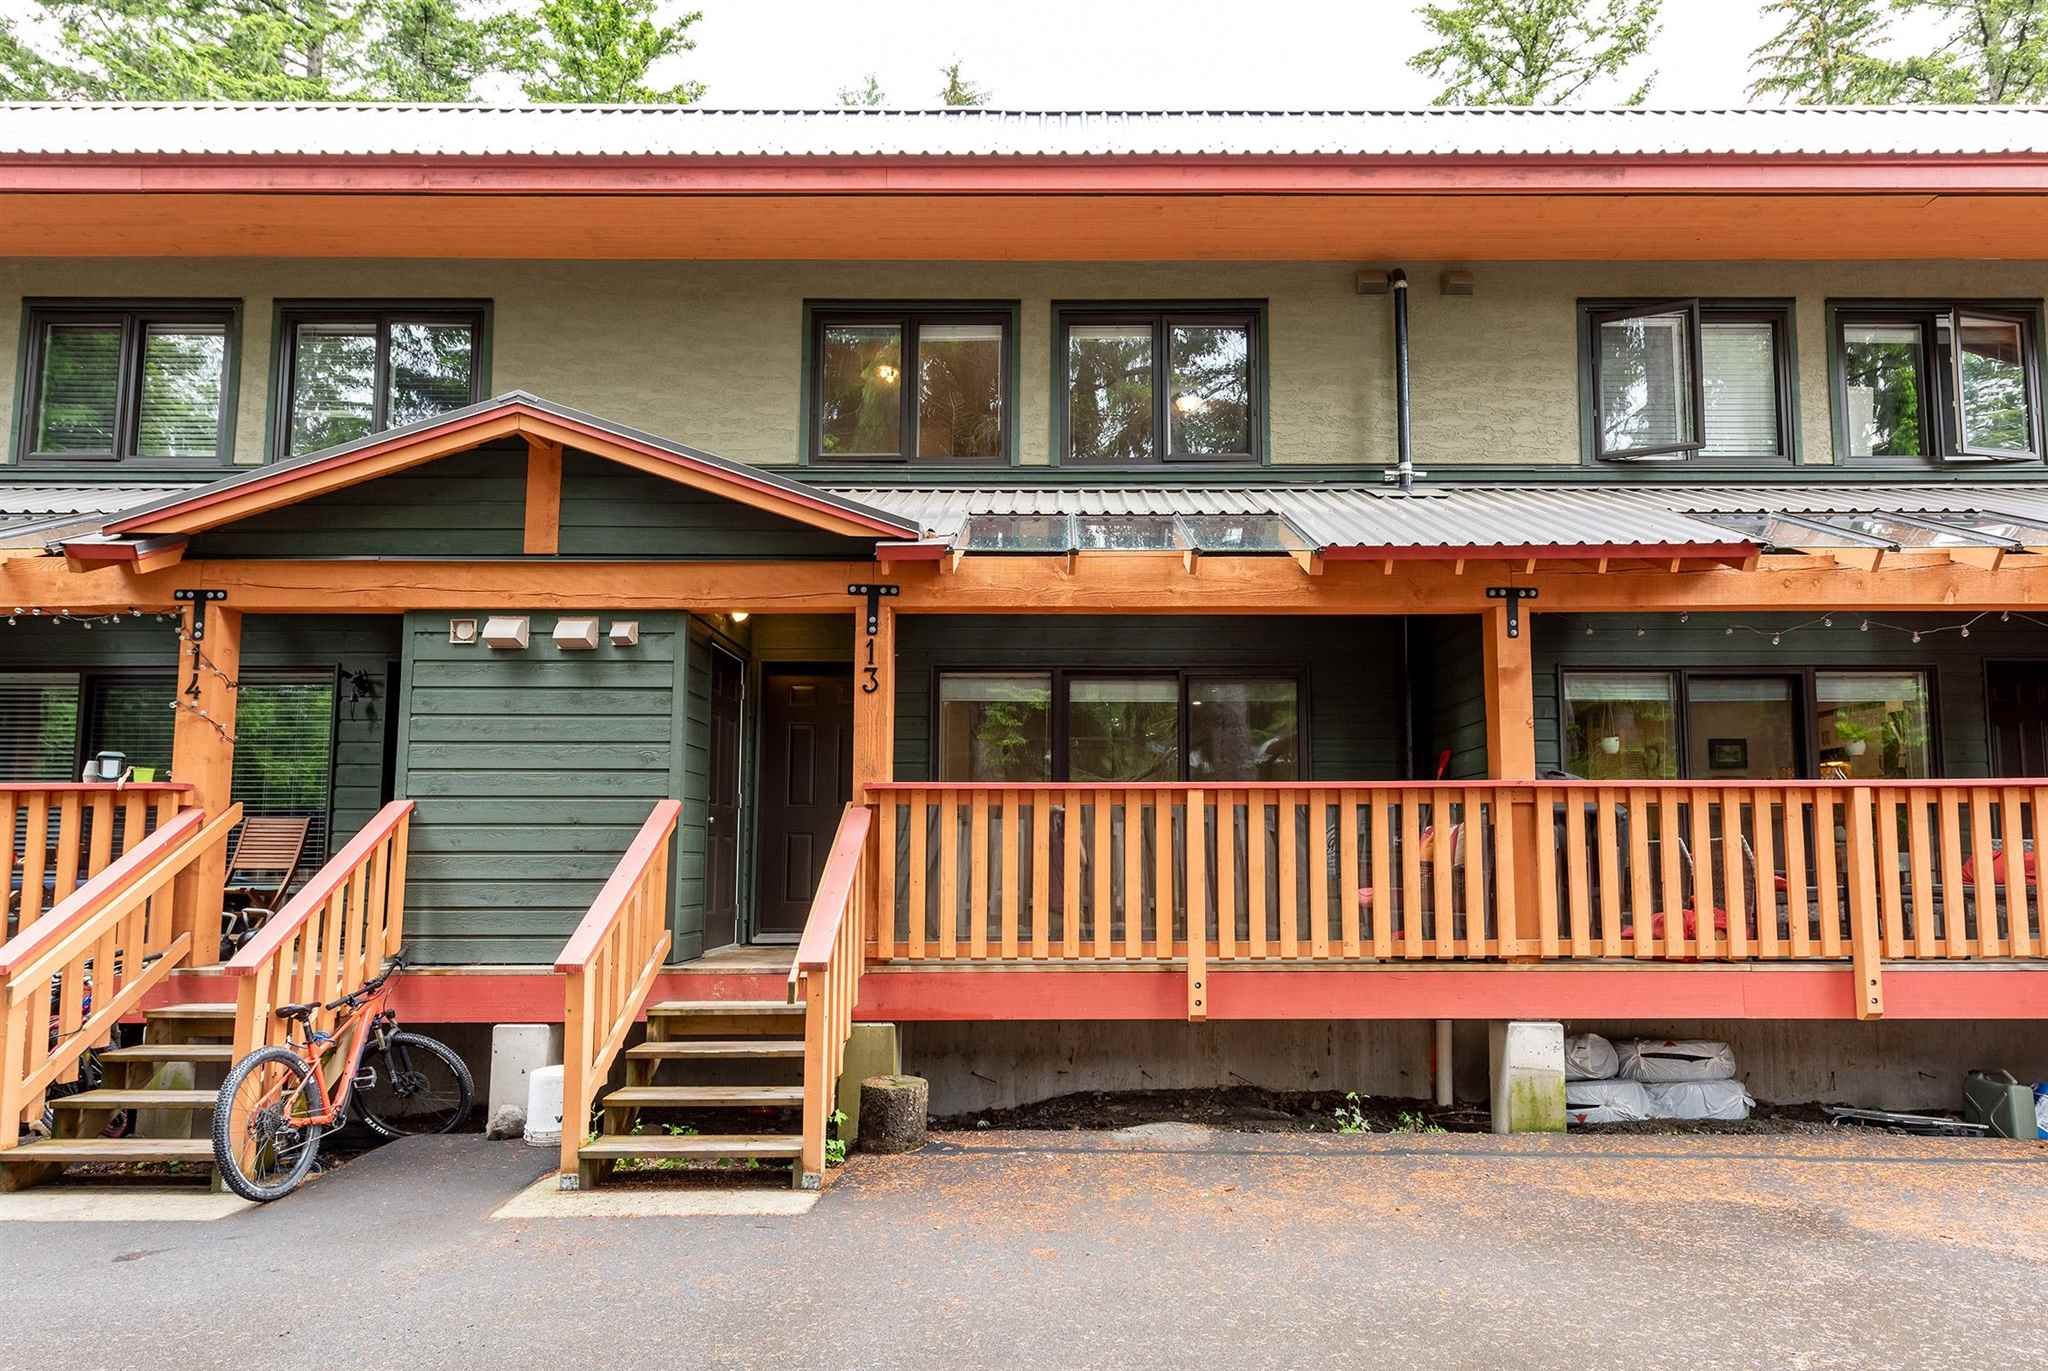 13 8100 ALPINE WAY - Alpine Meadows Townhouse for sale, 2 Bedrooms (R2594740)